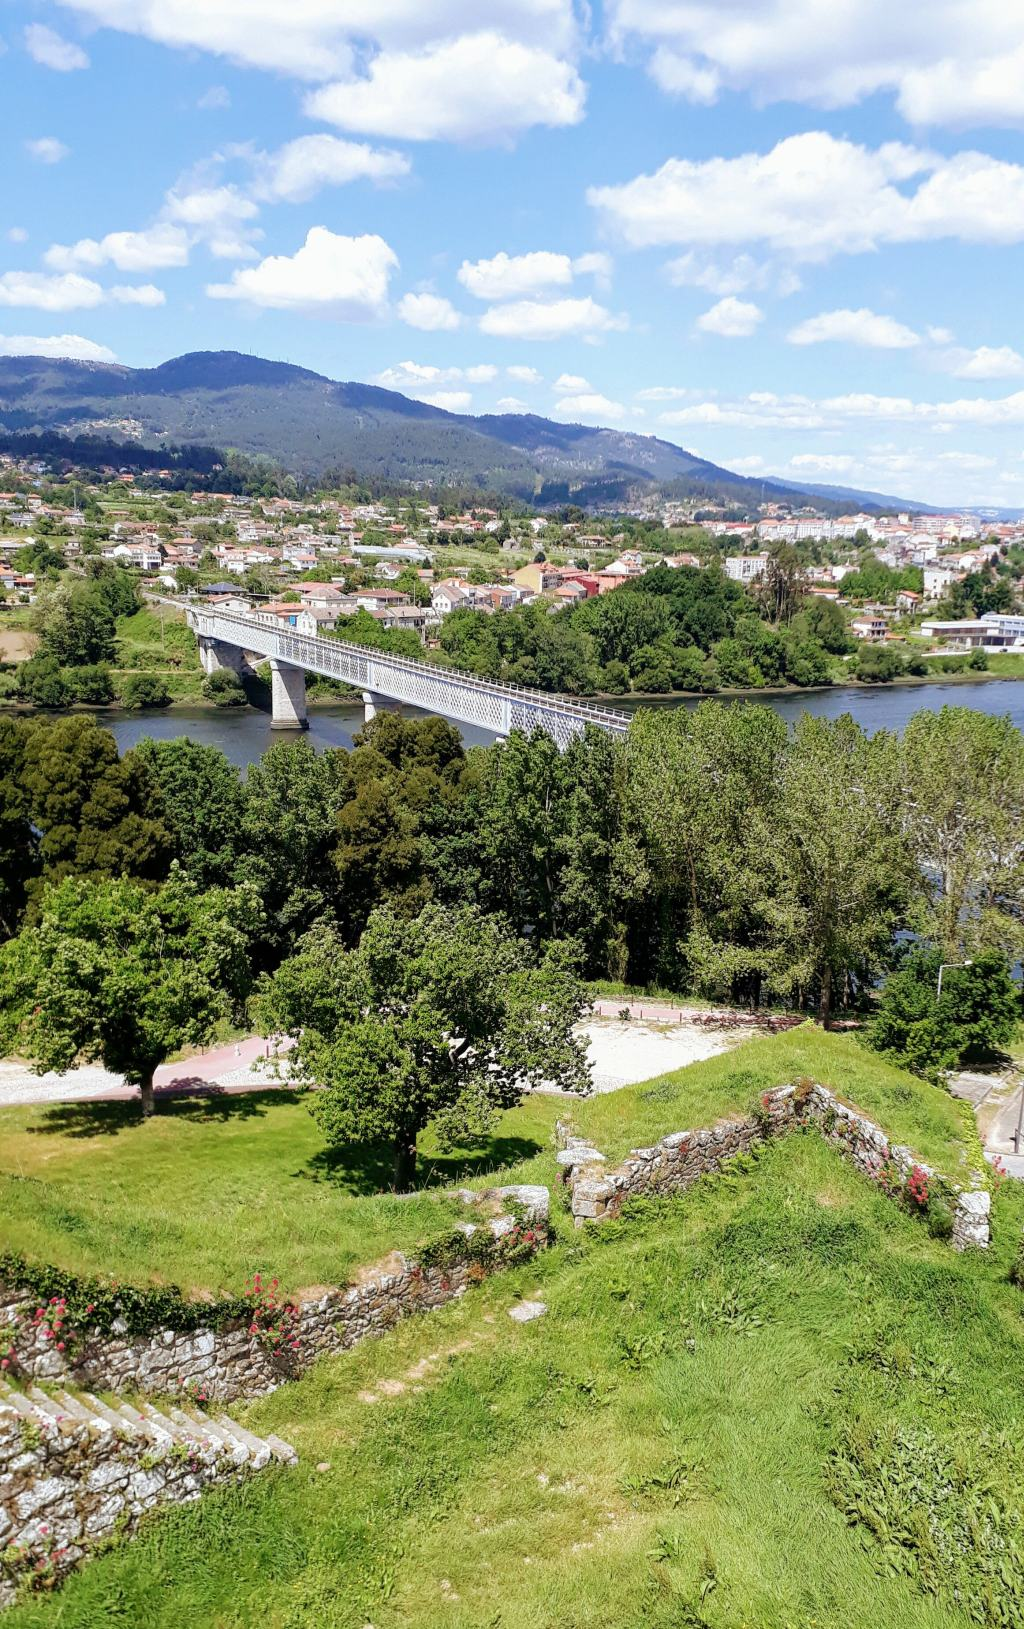 Magnificent view of the Ponte Internacional from Valença